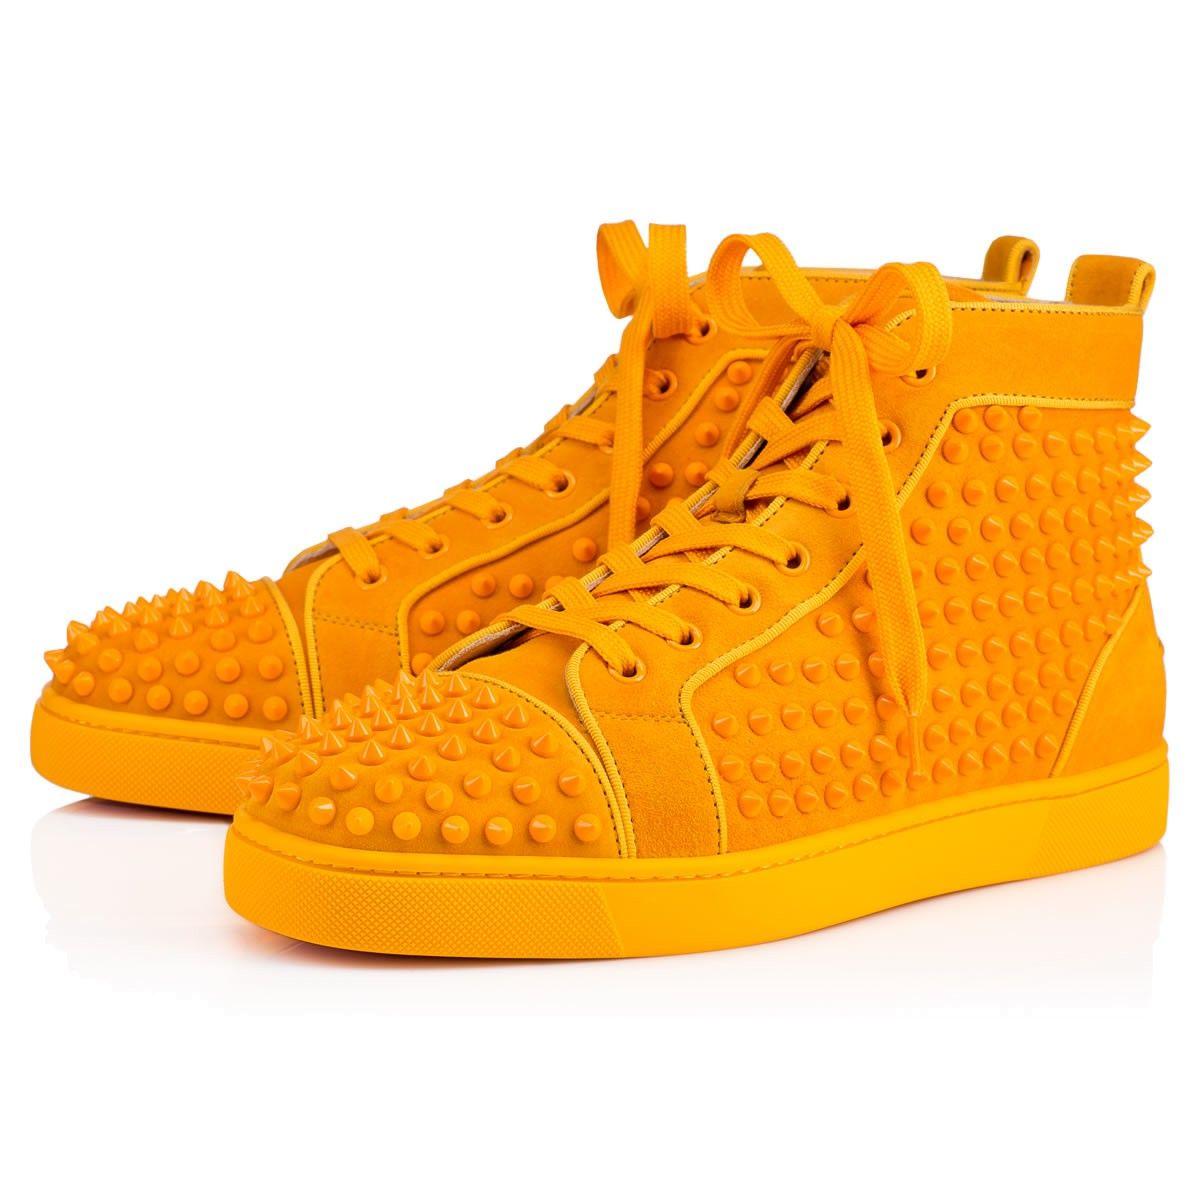 8a92216101c Shoes - Louis Orlato Veau Velours/spikes - Christian Louboutin ...